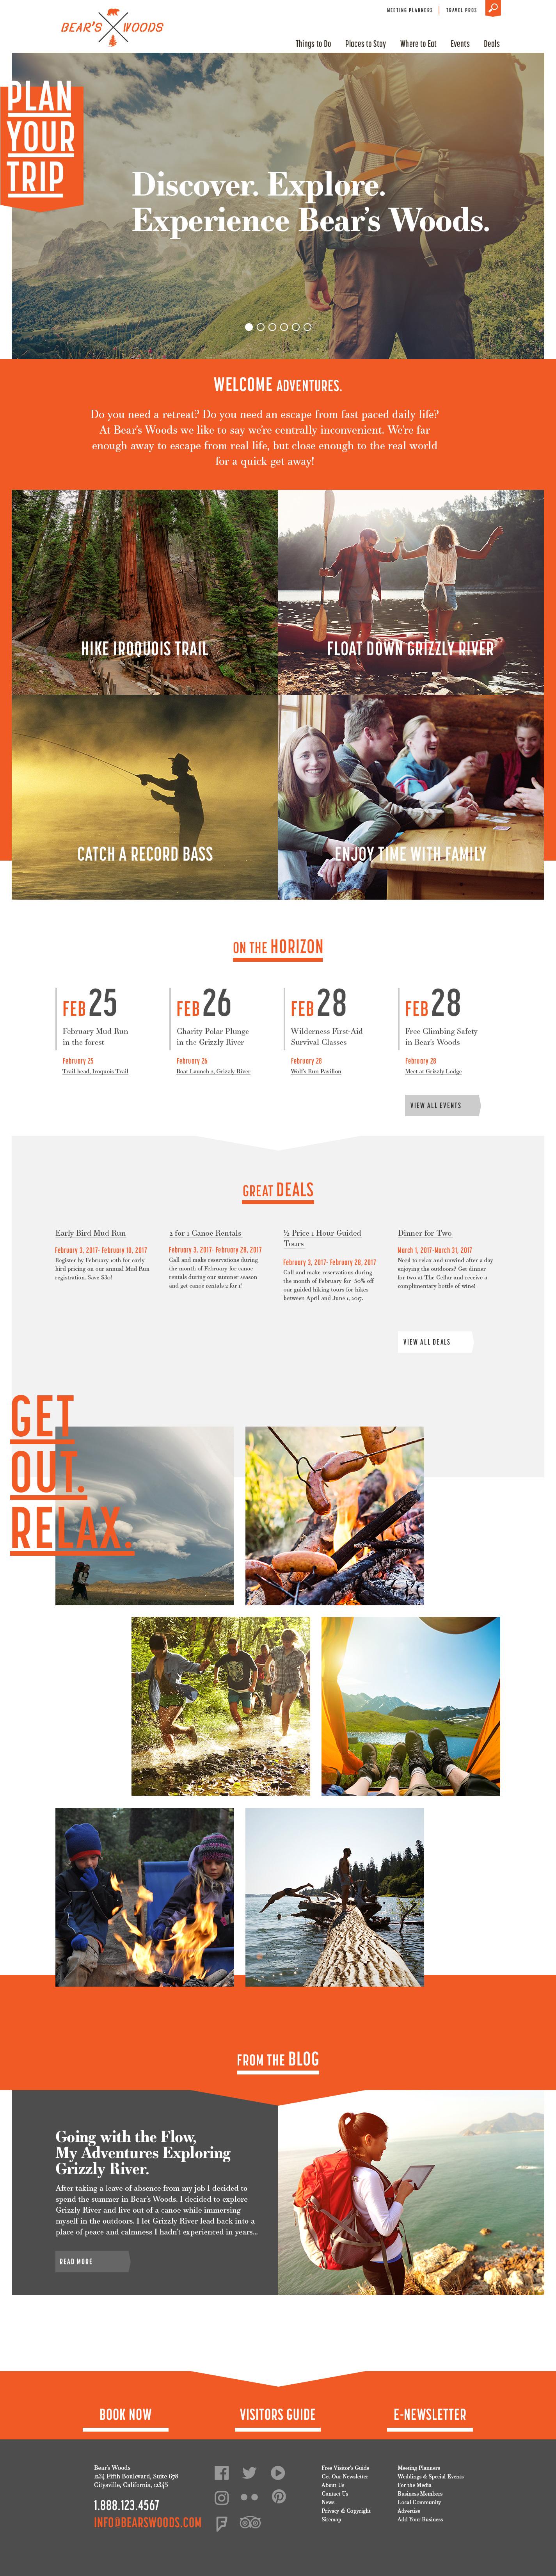 Bears Woods Theme Homepage Desktop Preview